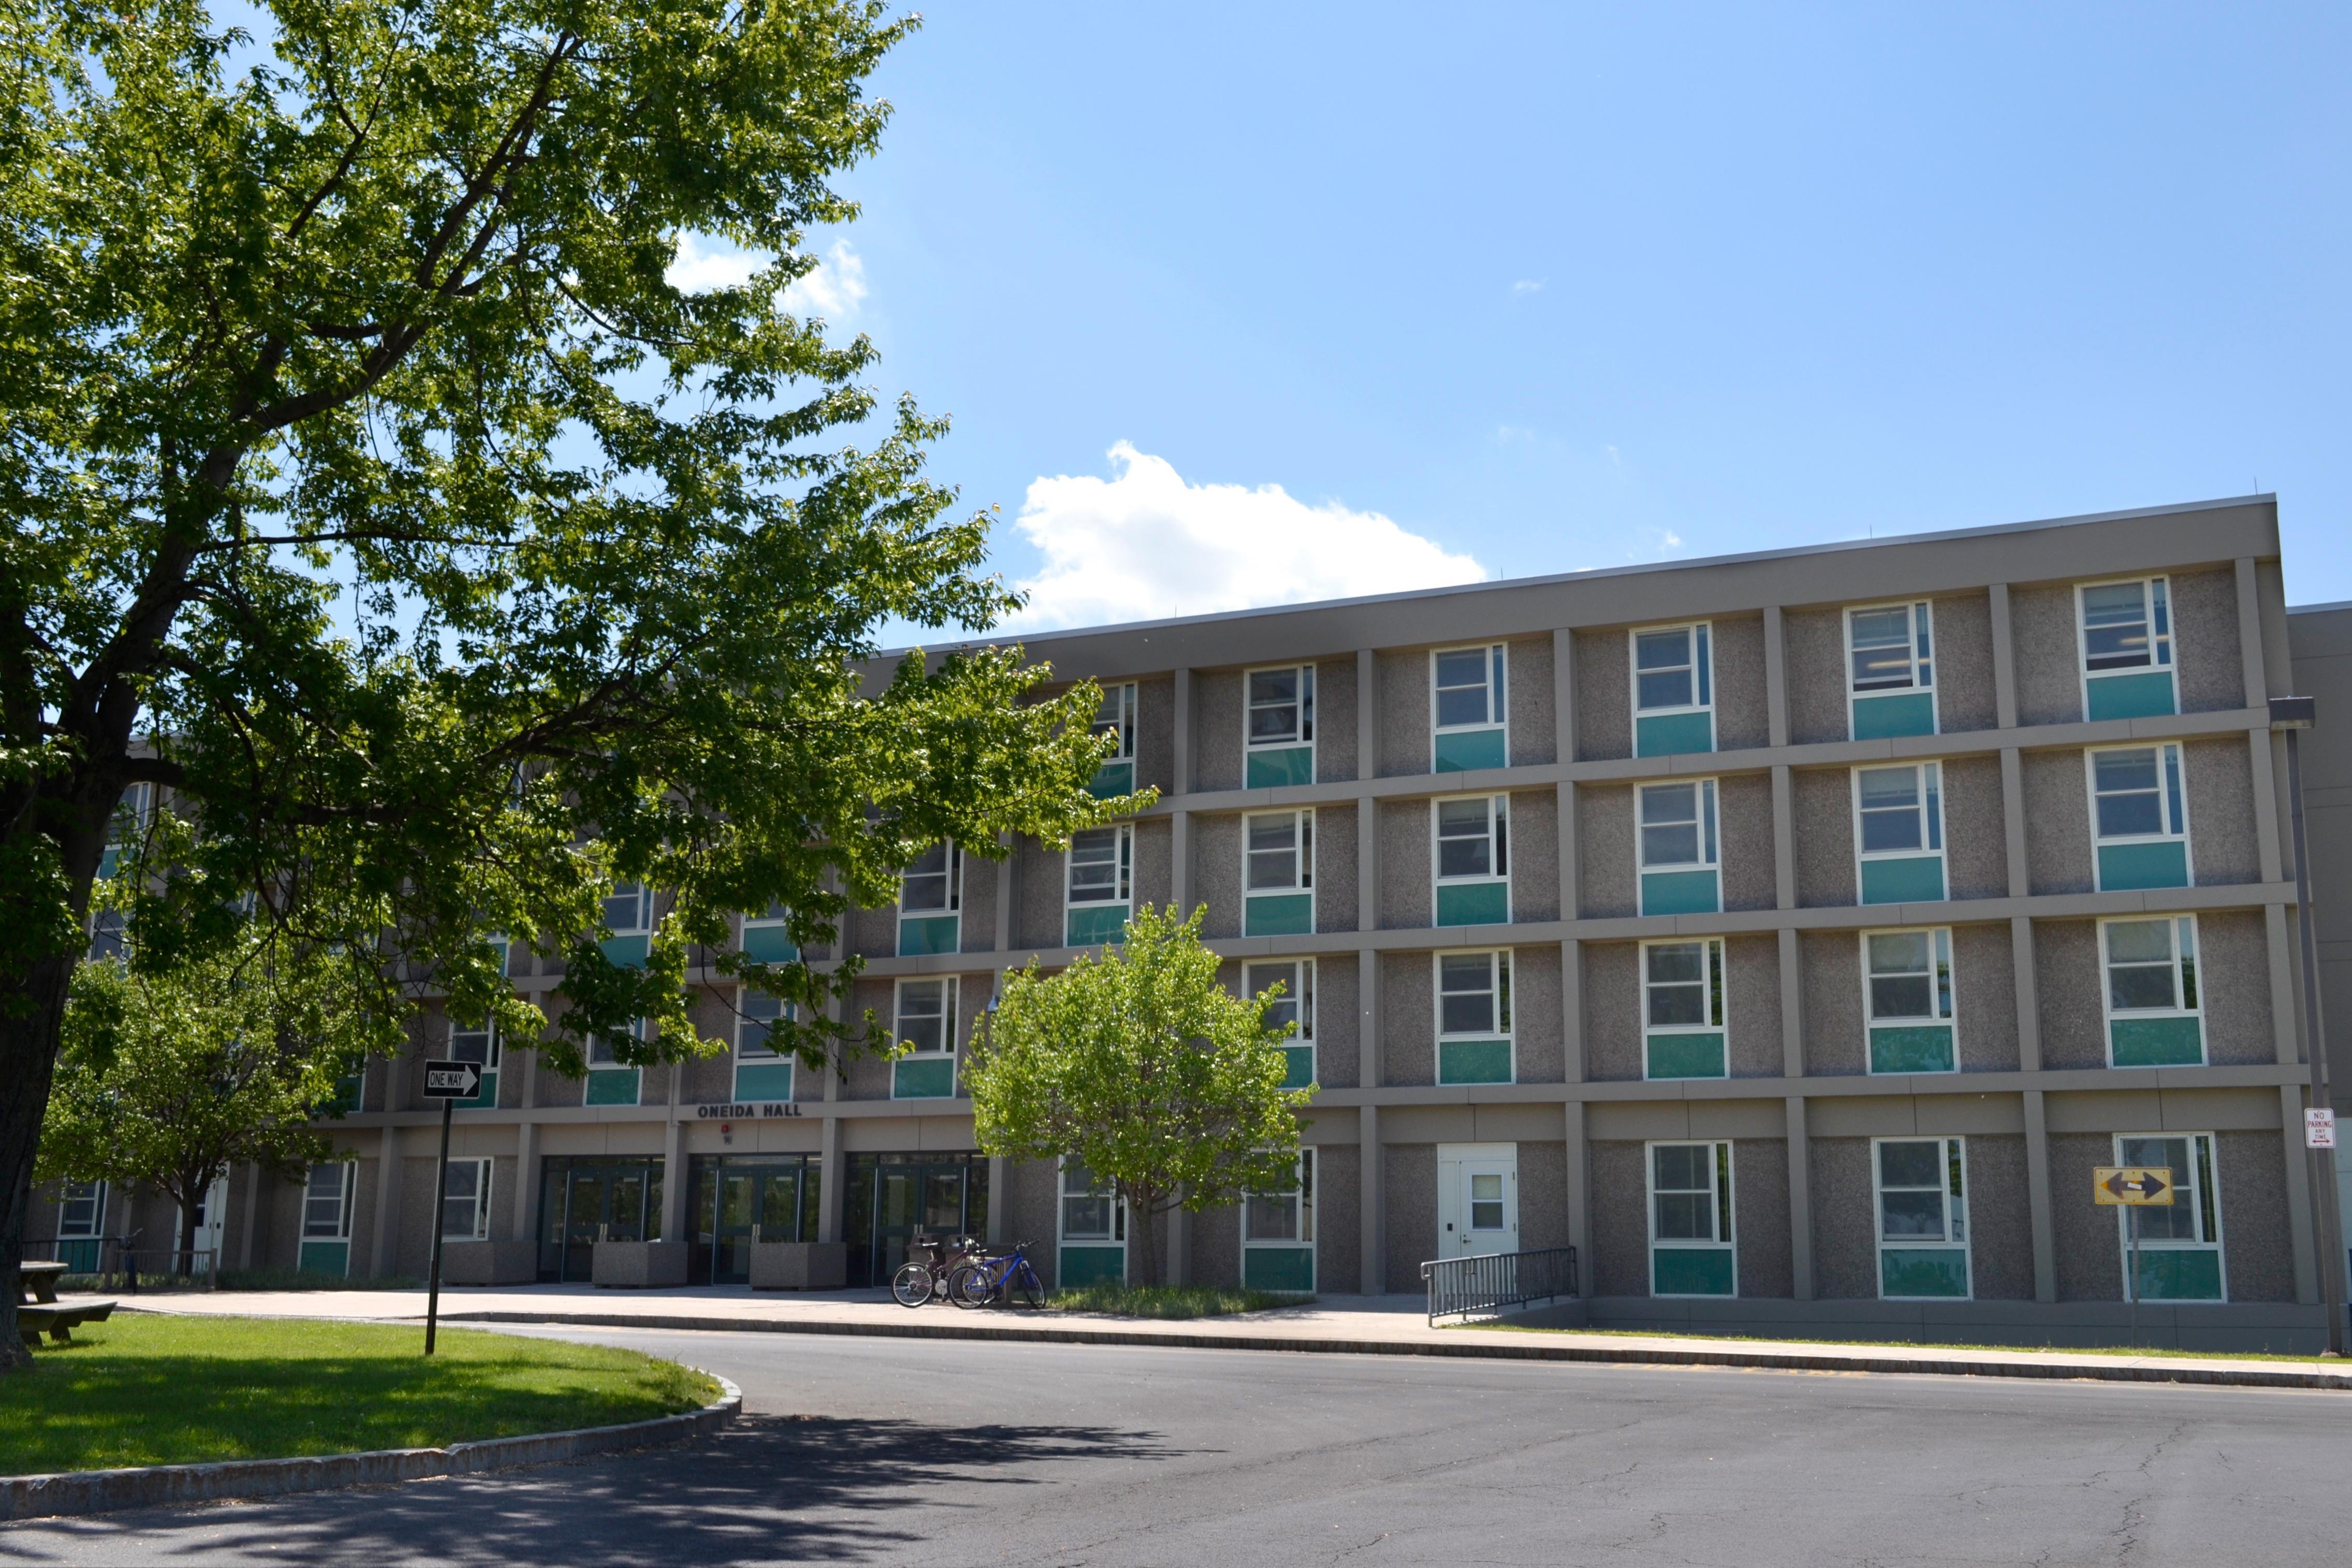 Oneida Hall on a summer day